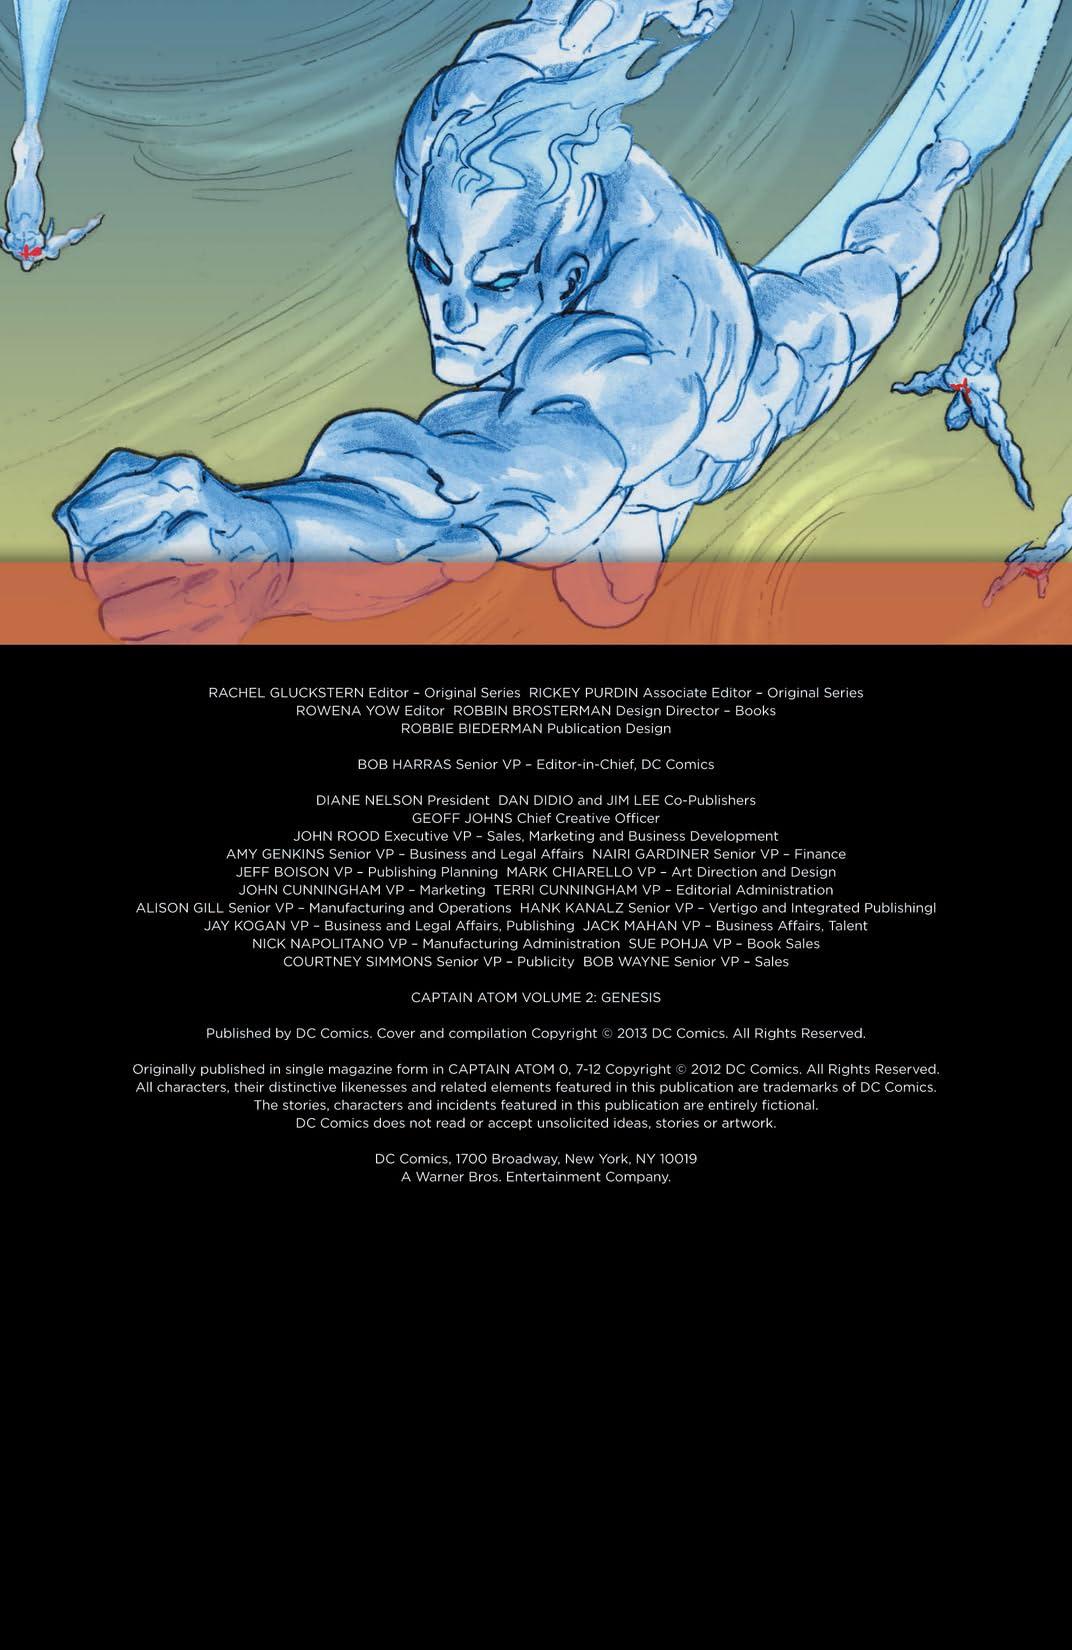 Captain Atom (2011-2012) Vol. 2: Genesis